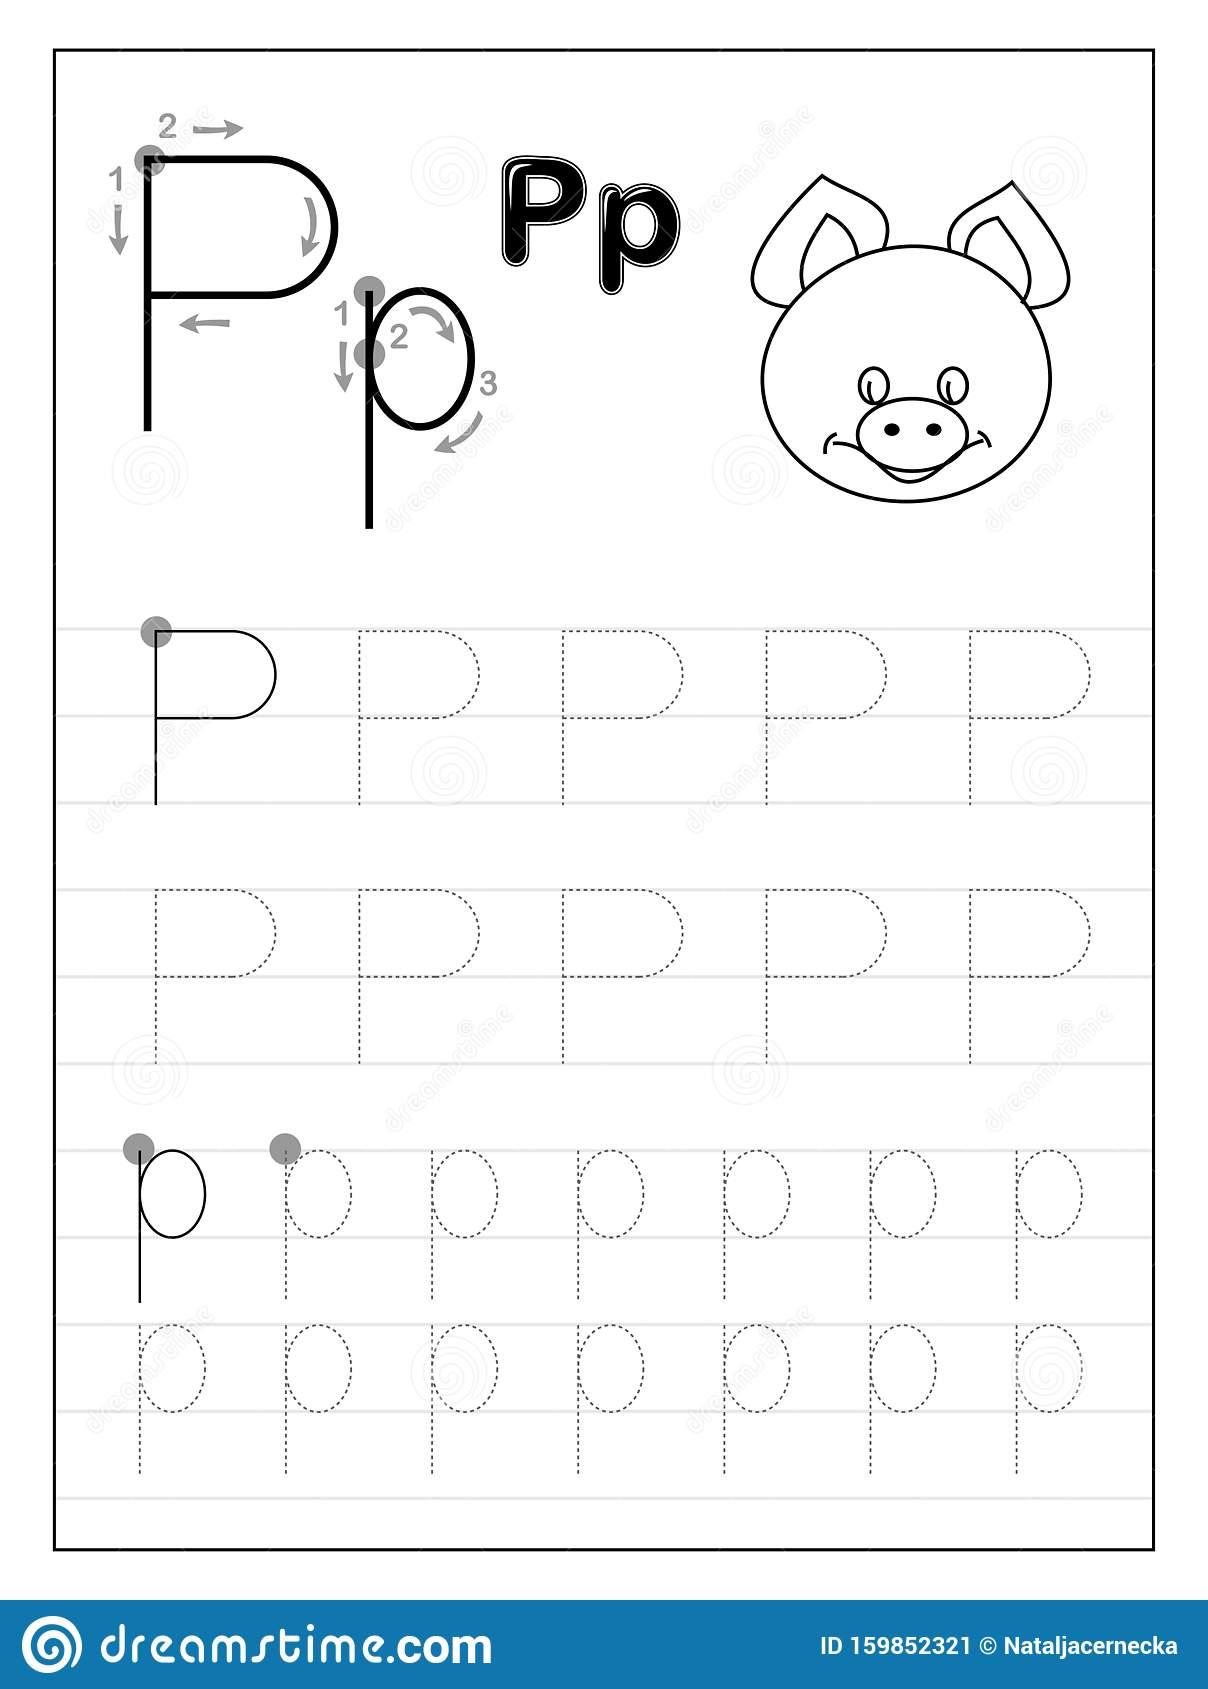 Printable Letter Templates For Preschoolber Tracingheets inside Alphabet Tracing Stencils